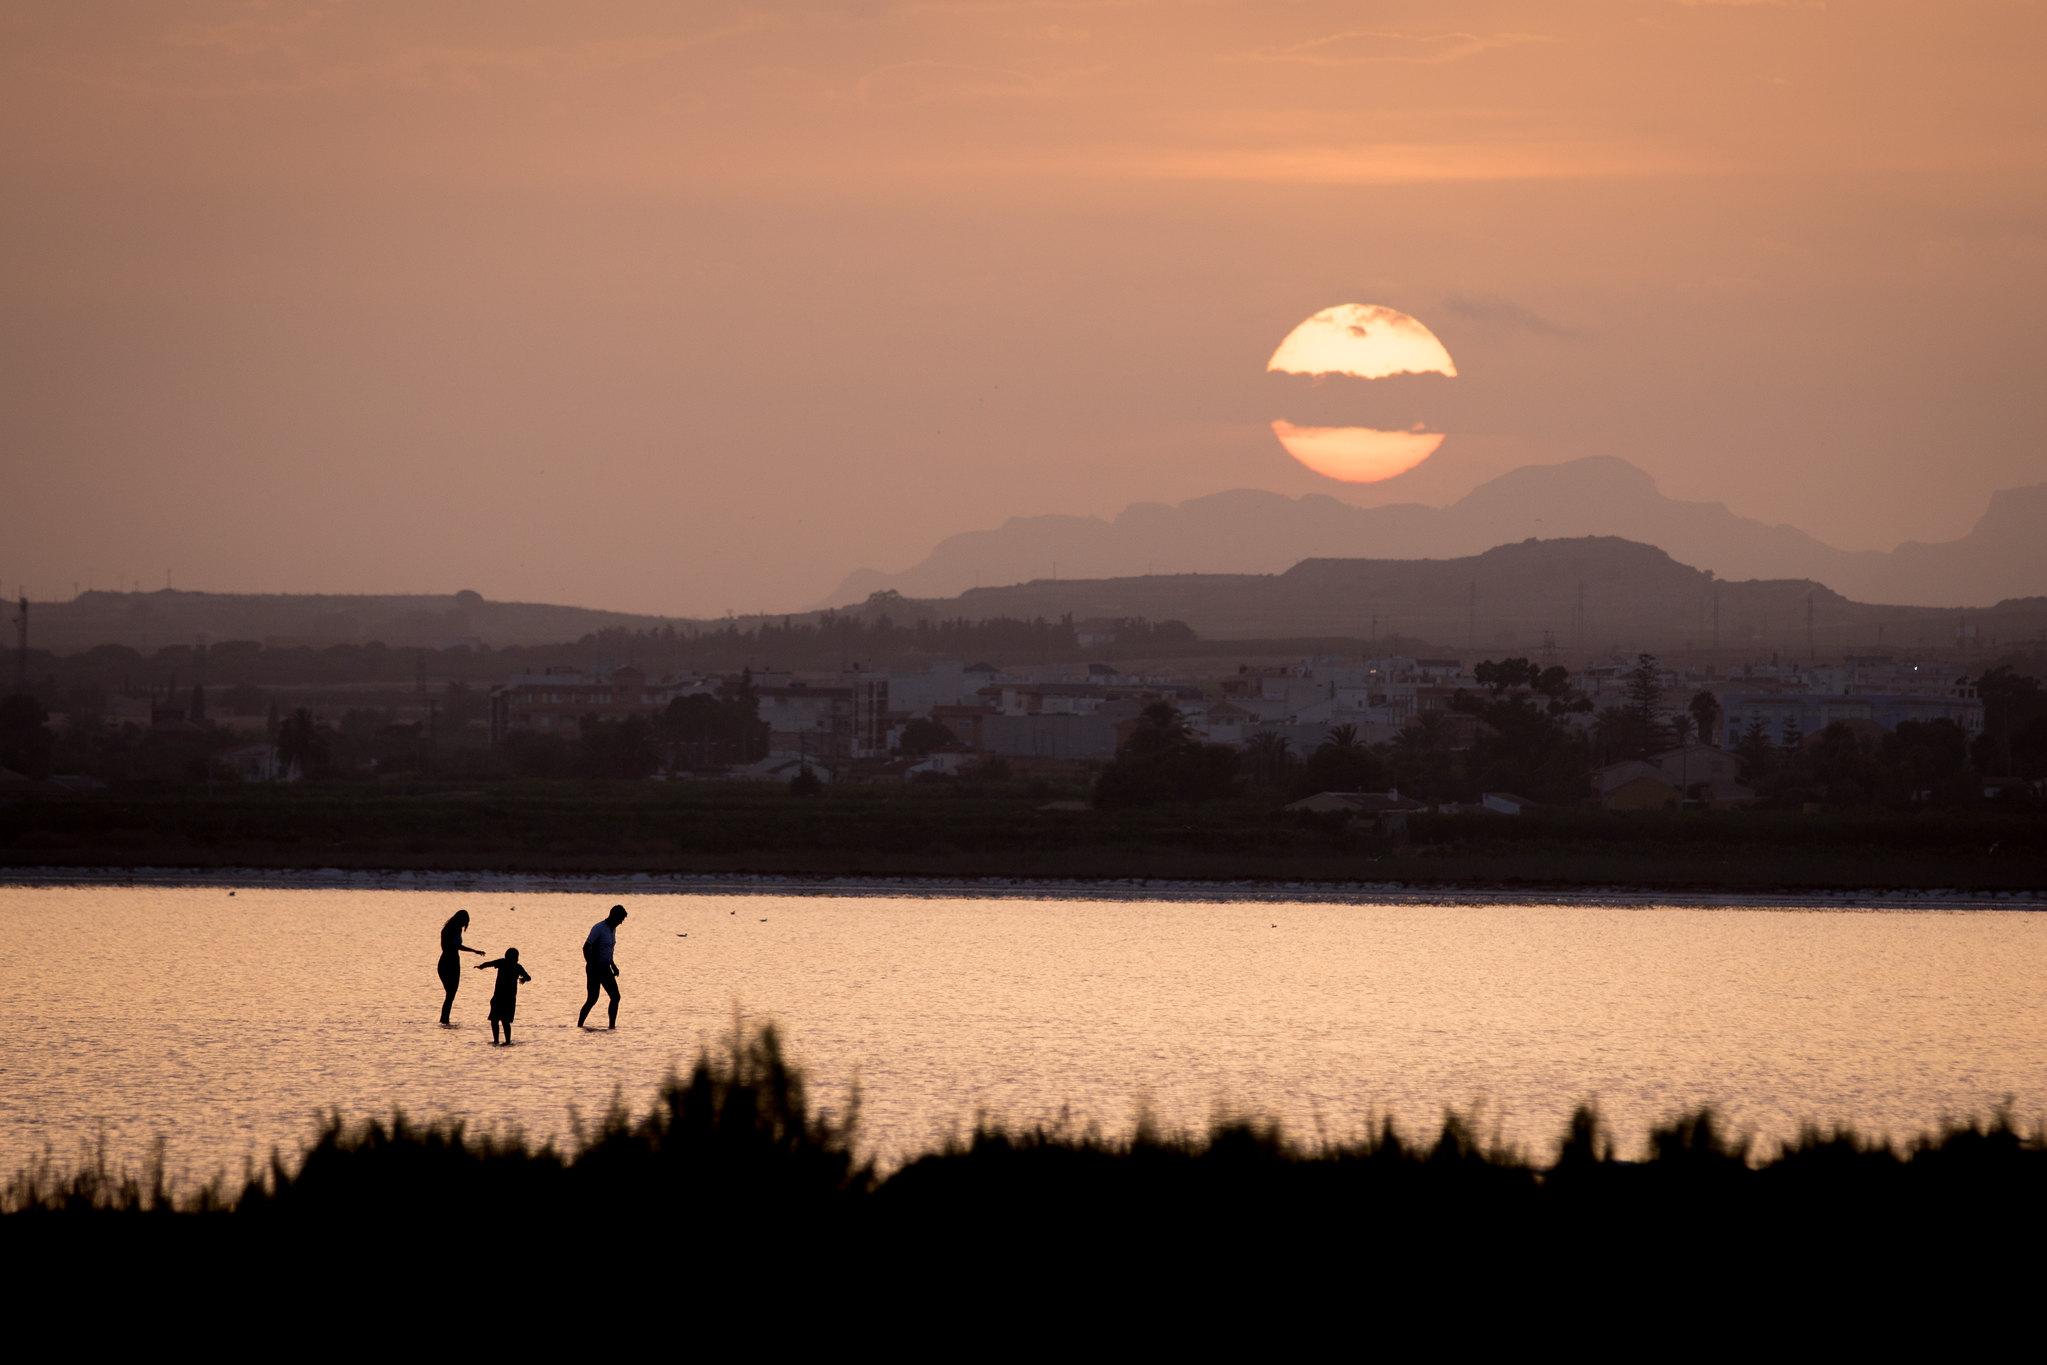 Sunset over saltlake, silhouettes